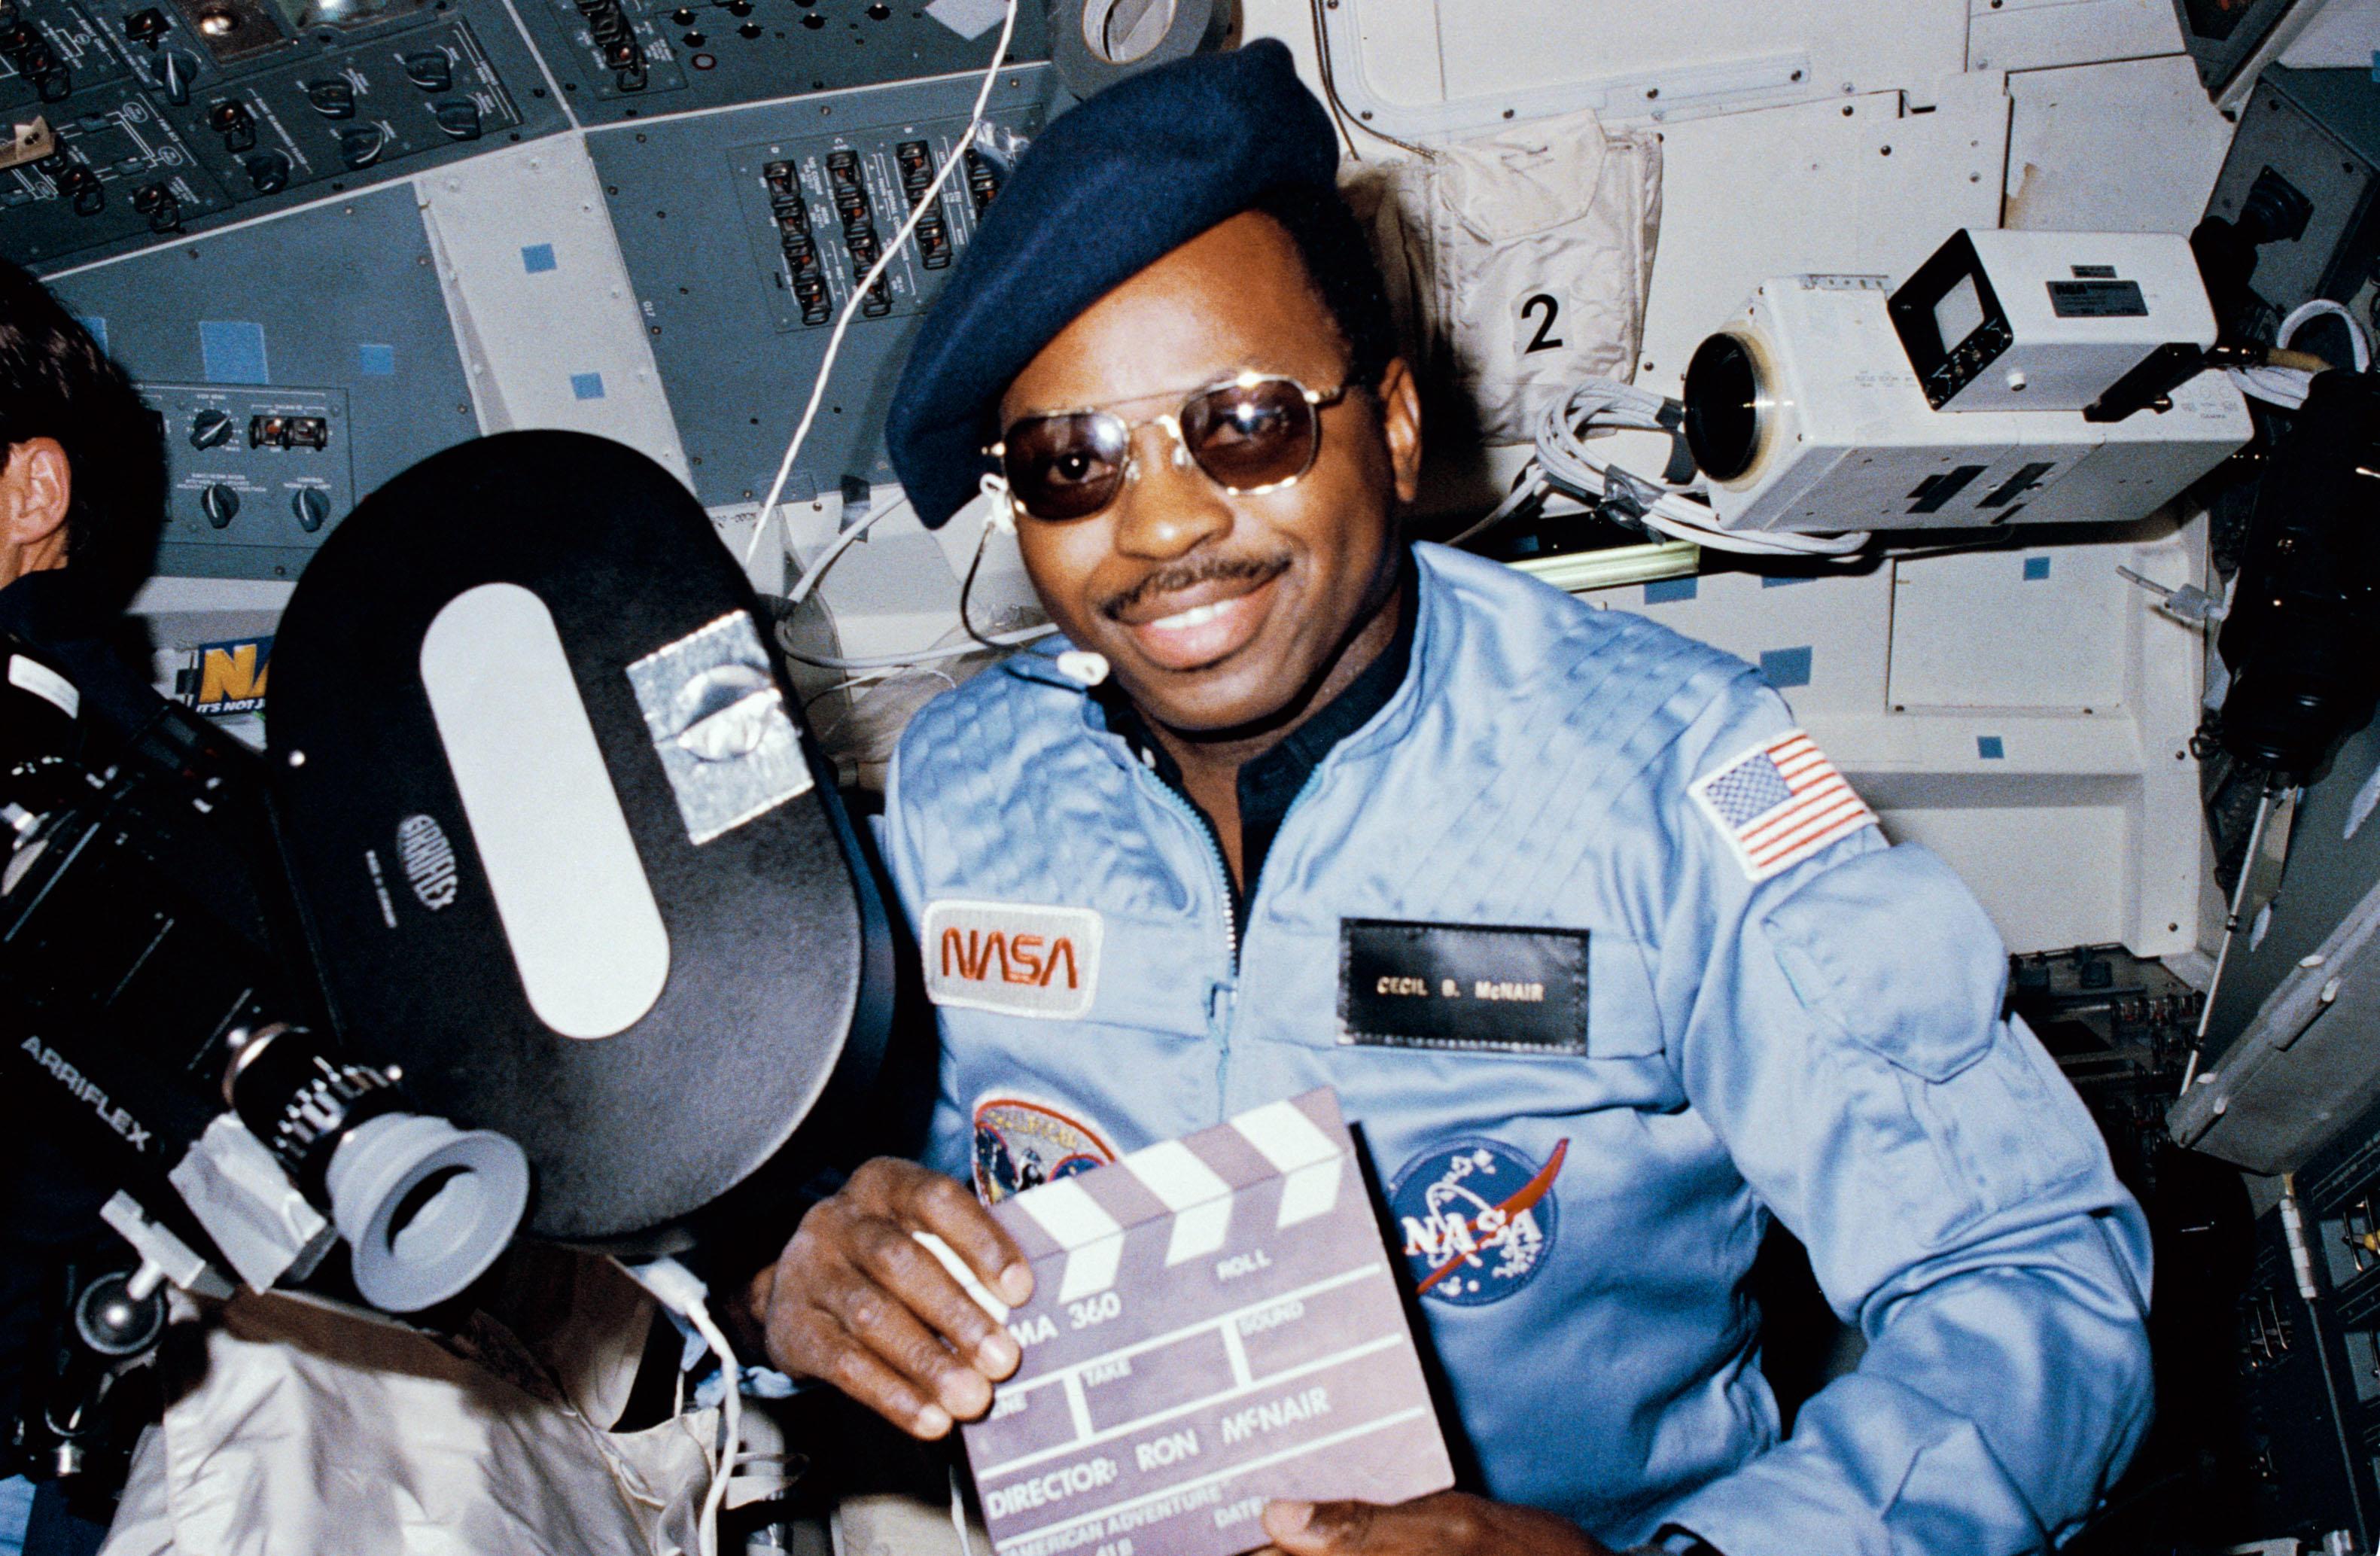 S84-27219 (3-11 Feb 1984) - Astronaut Ronald E. McNair, 41-B mission specialist